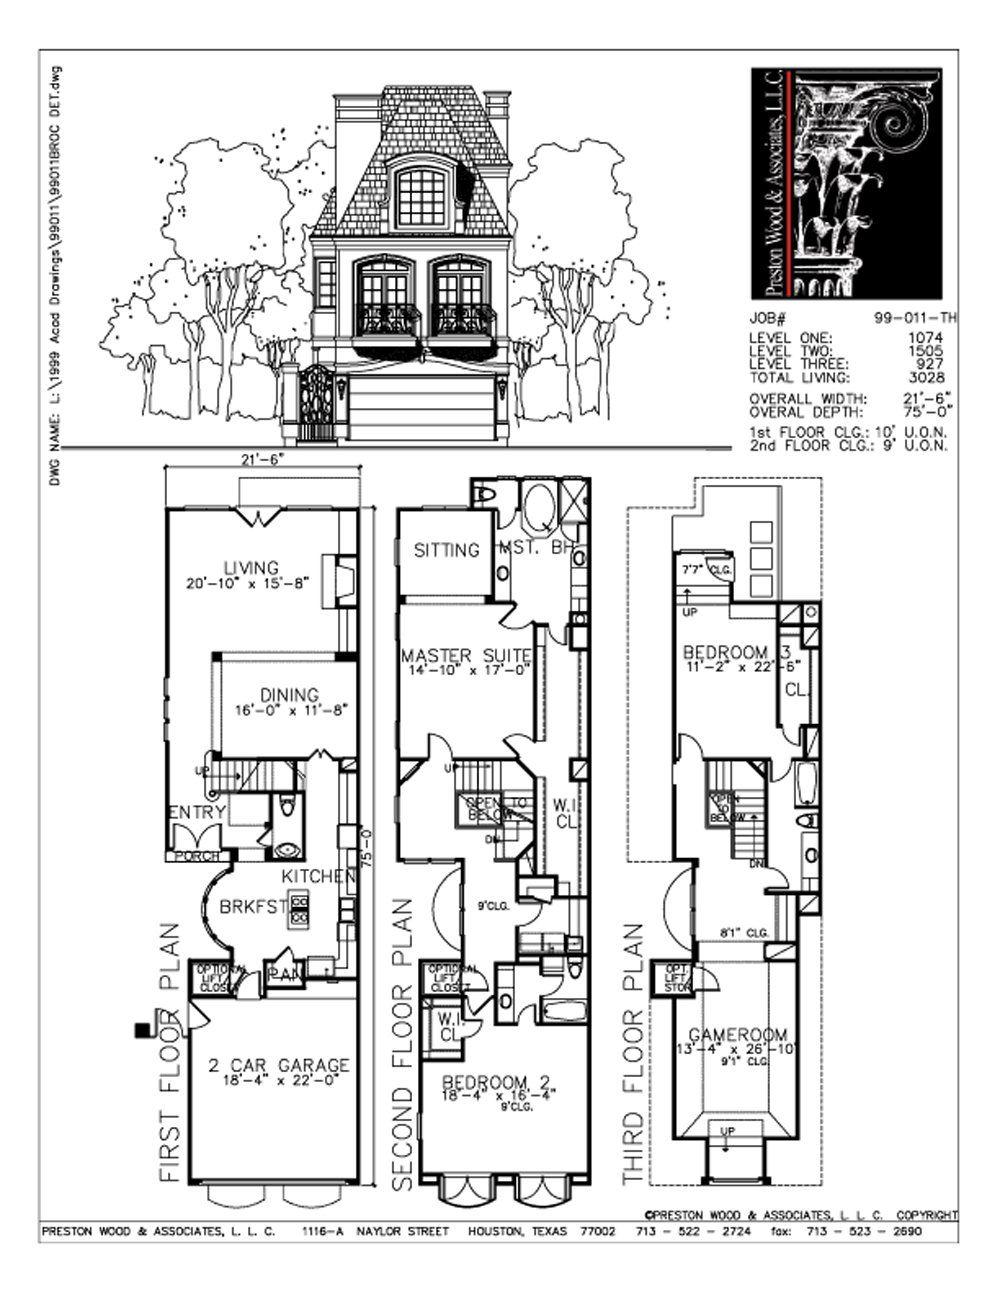 Townhouse Plan C9011 Narrow Lot House Plans Floor Plans House Floor Plans